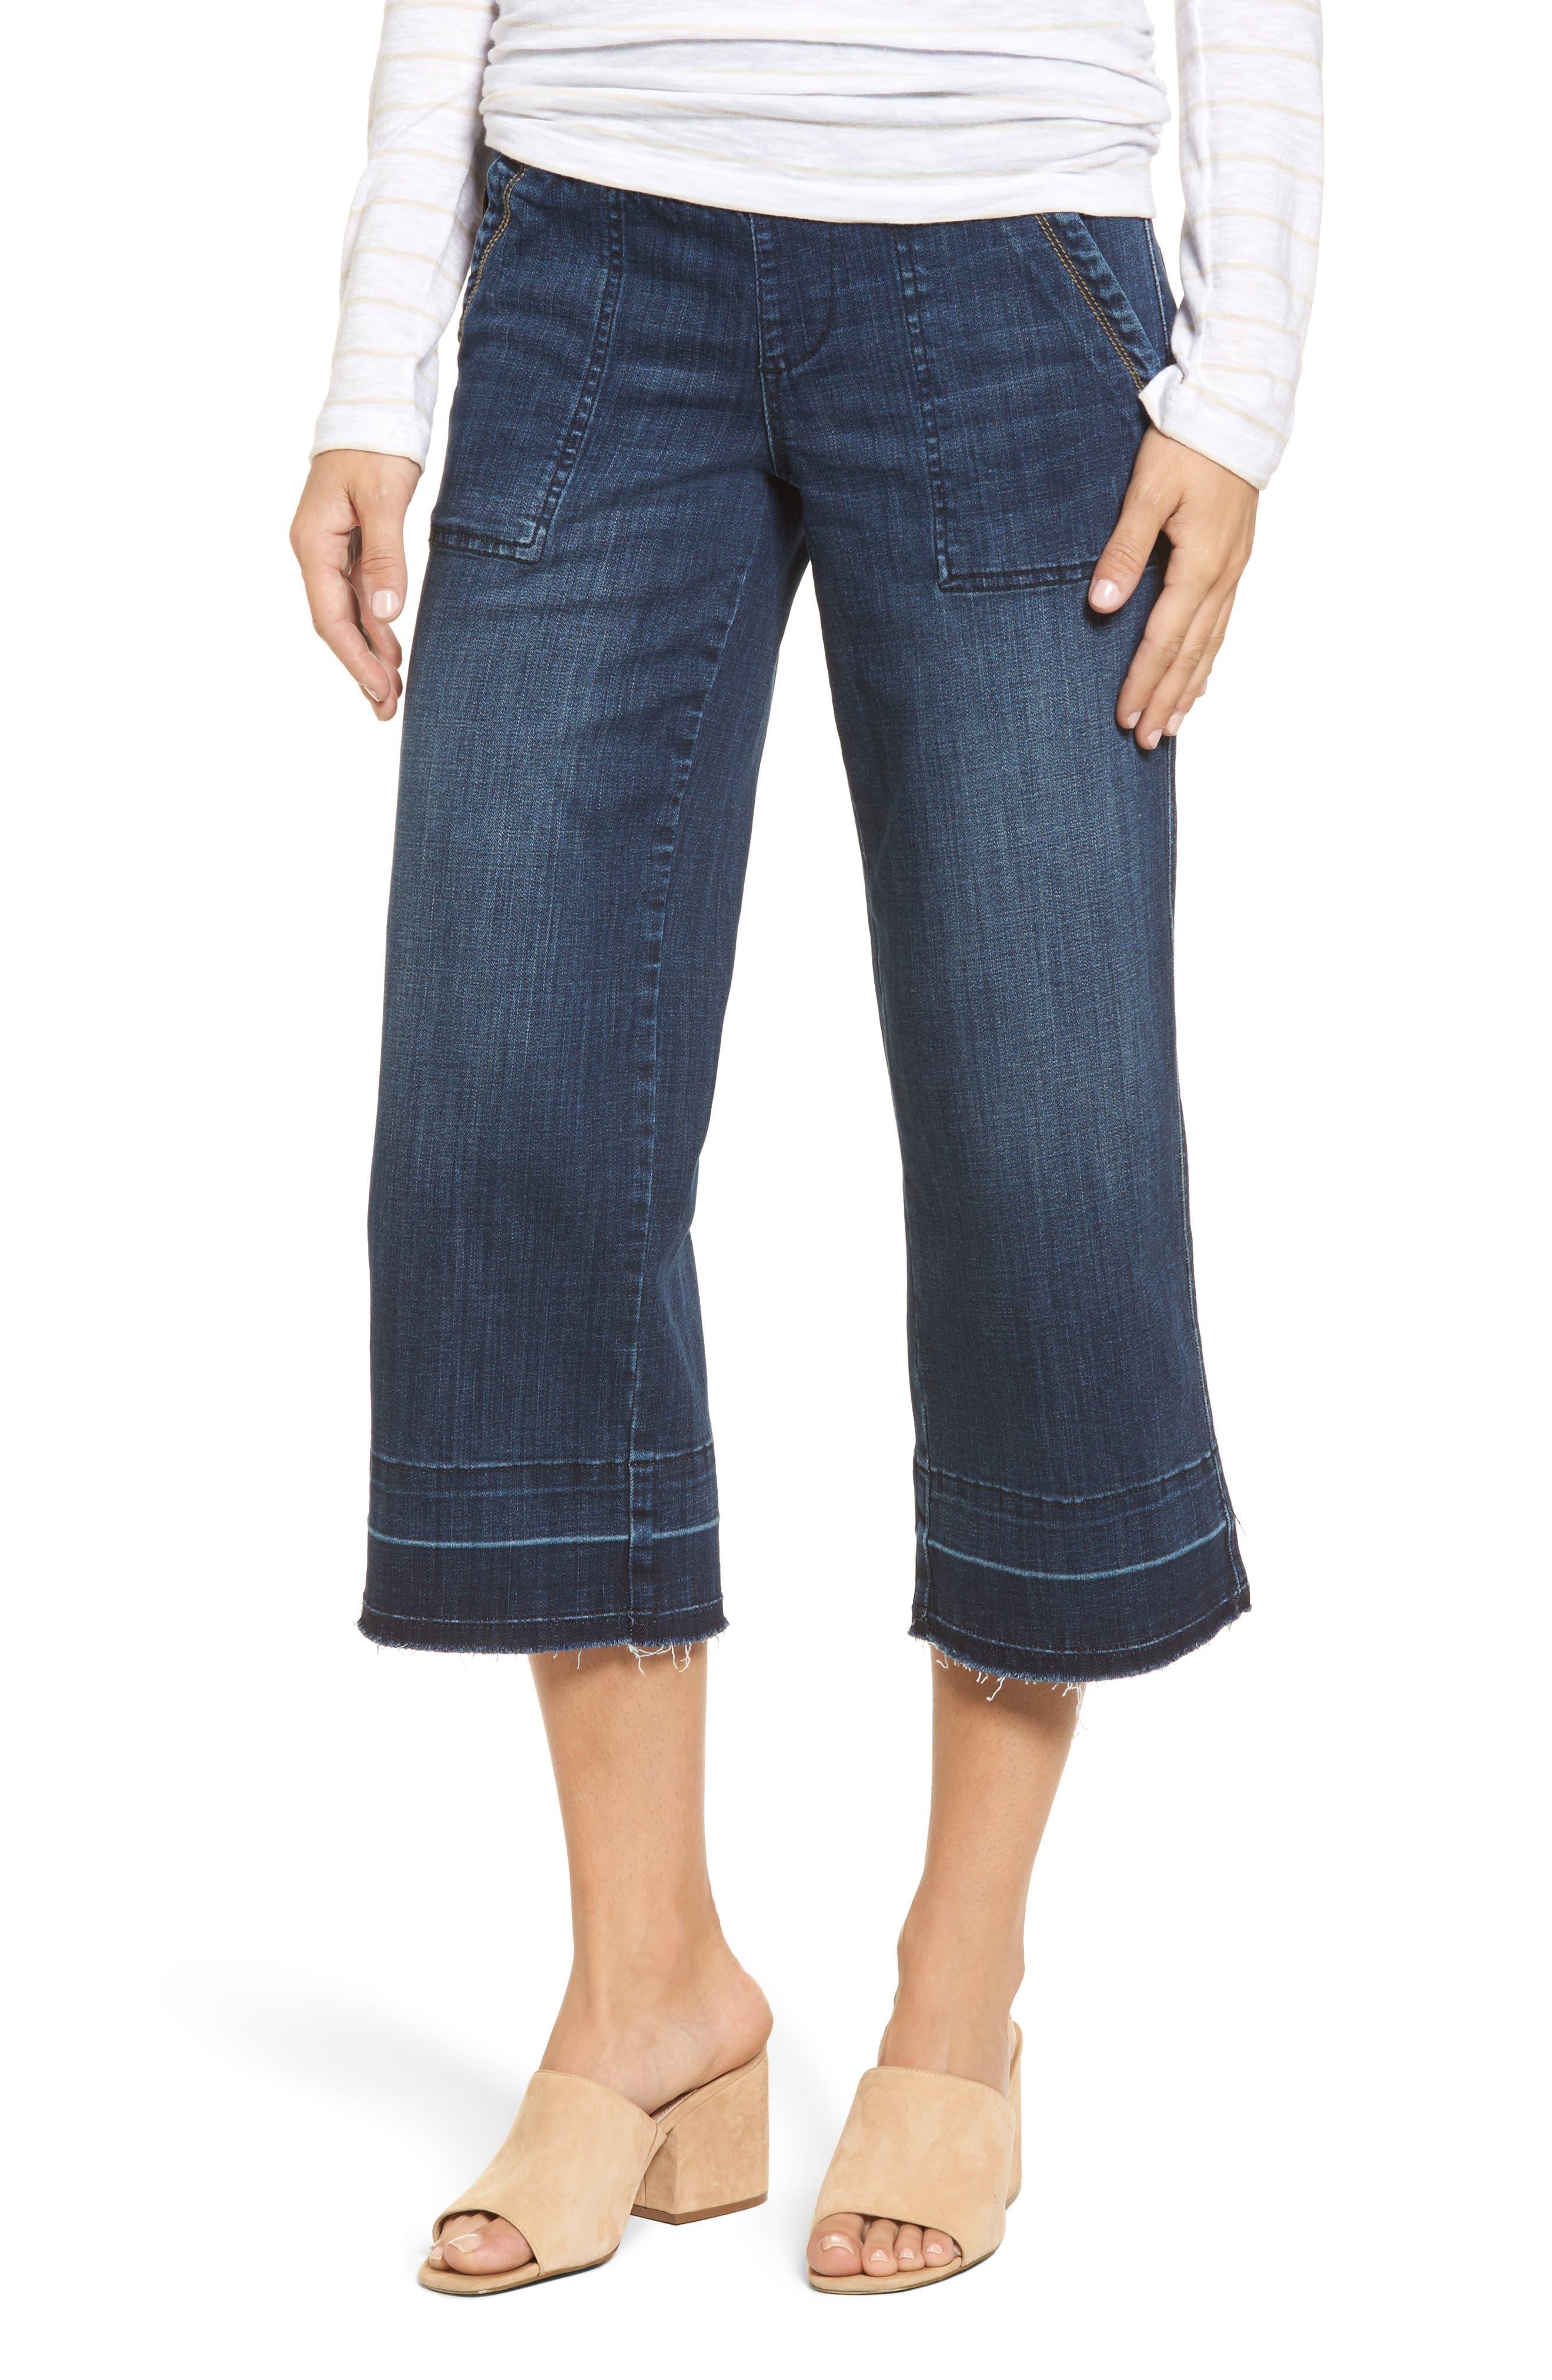 Alternate Image 1 Selected - Jag Jeans Snyder Pull-On Wide Leg Jeans (Thorne Blue)